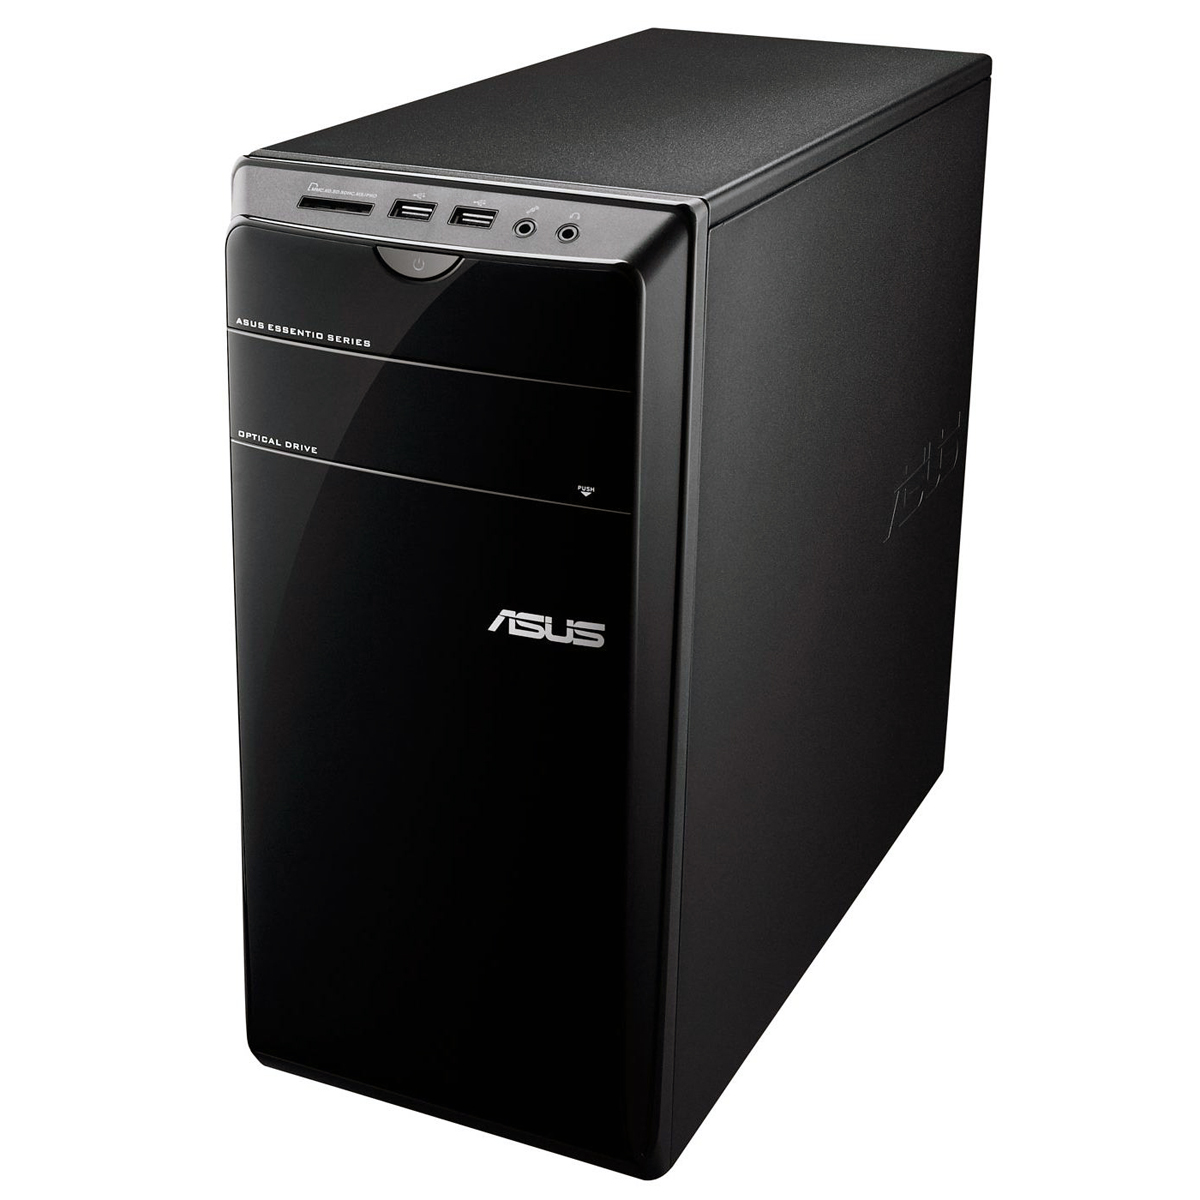 PC de bureau ASUS Essentio CM6730-FRCH04 Intel Core i5-2320 4 Go 2 To AMD Radeon HD 6470 Graveur DVD Windows 7 Premium 64 bits